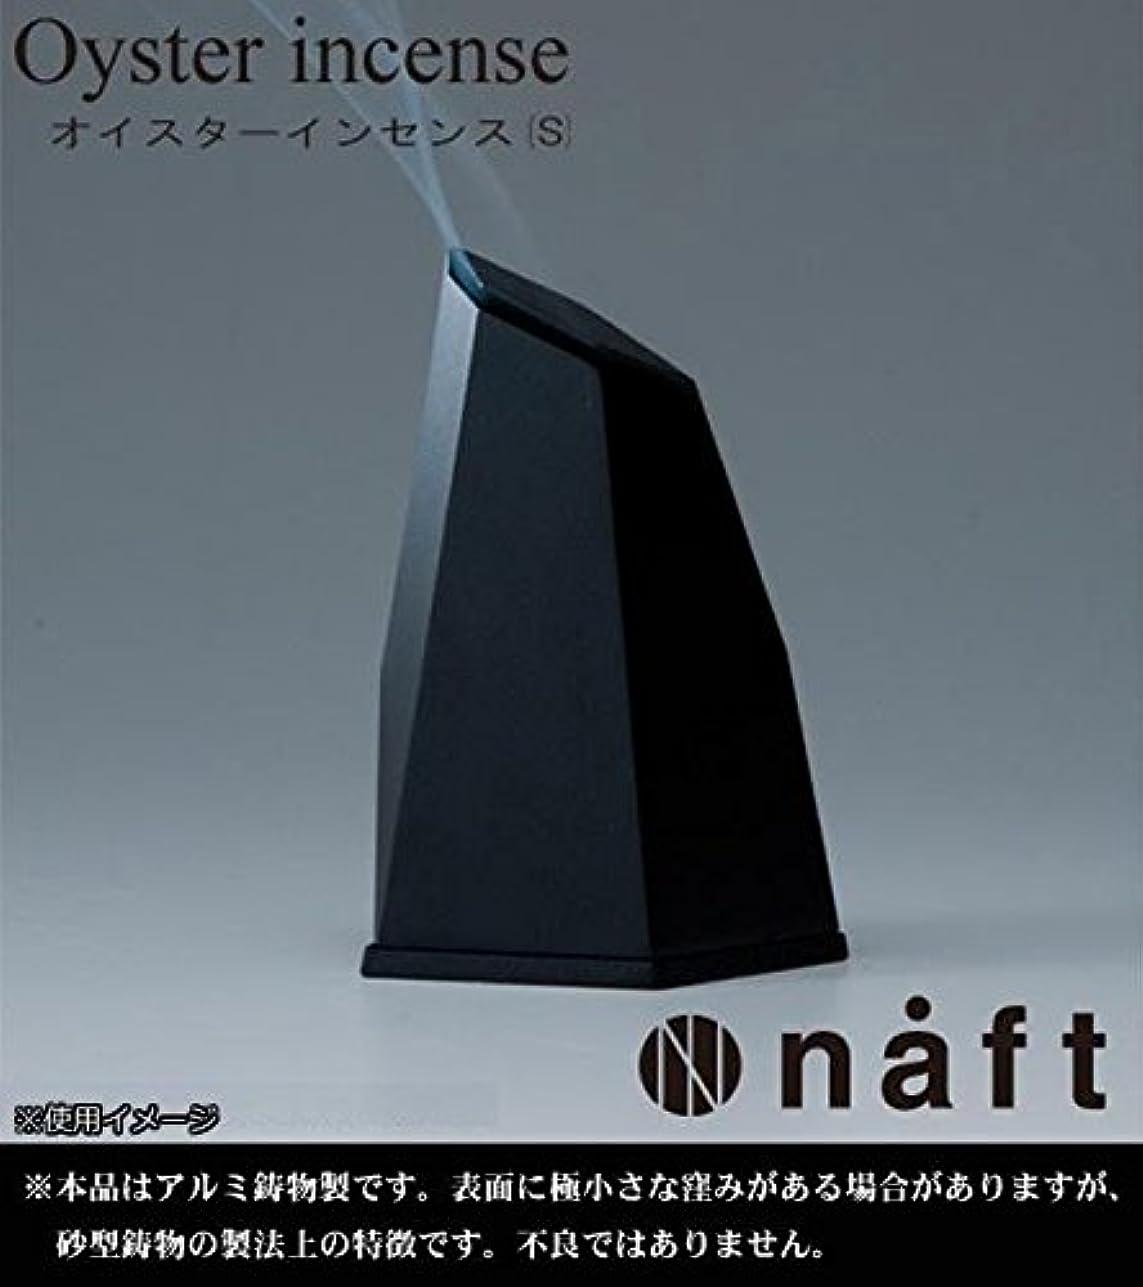 naft Oyster incense オイスターインセンス 香炉 Sサイズ ブラック